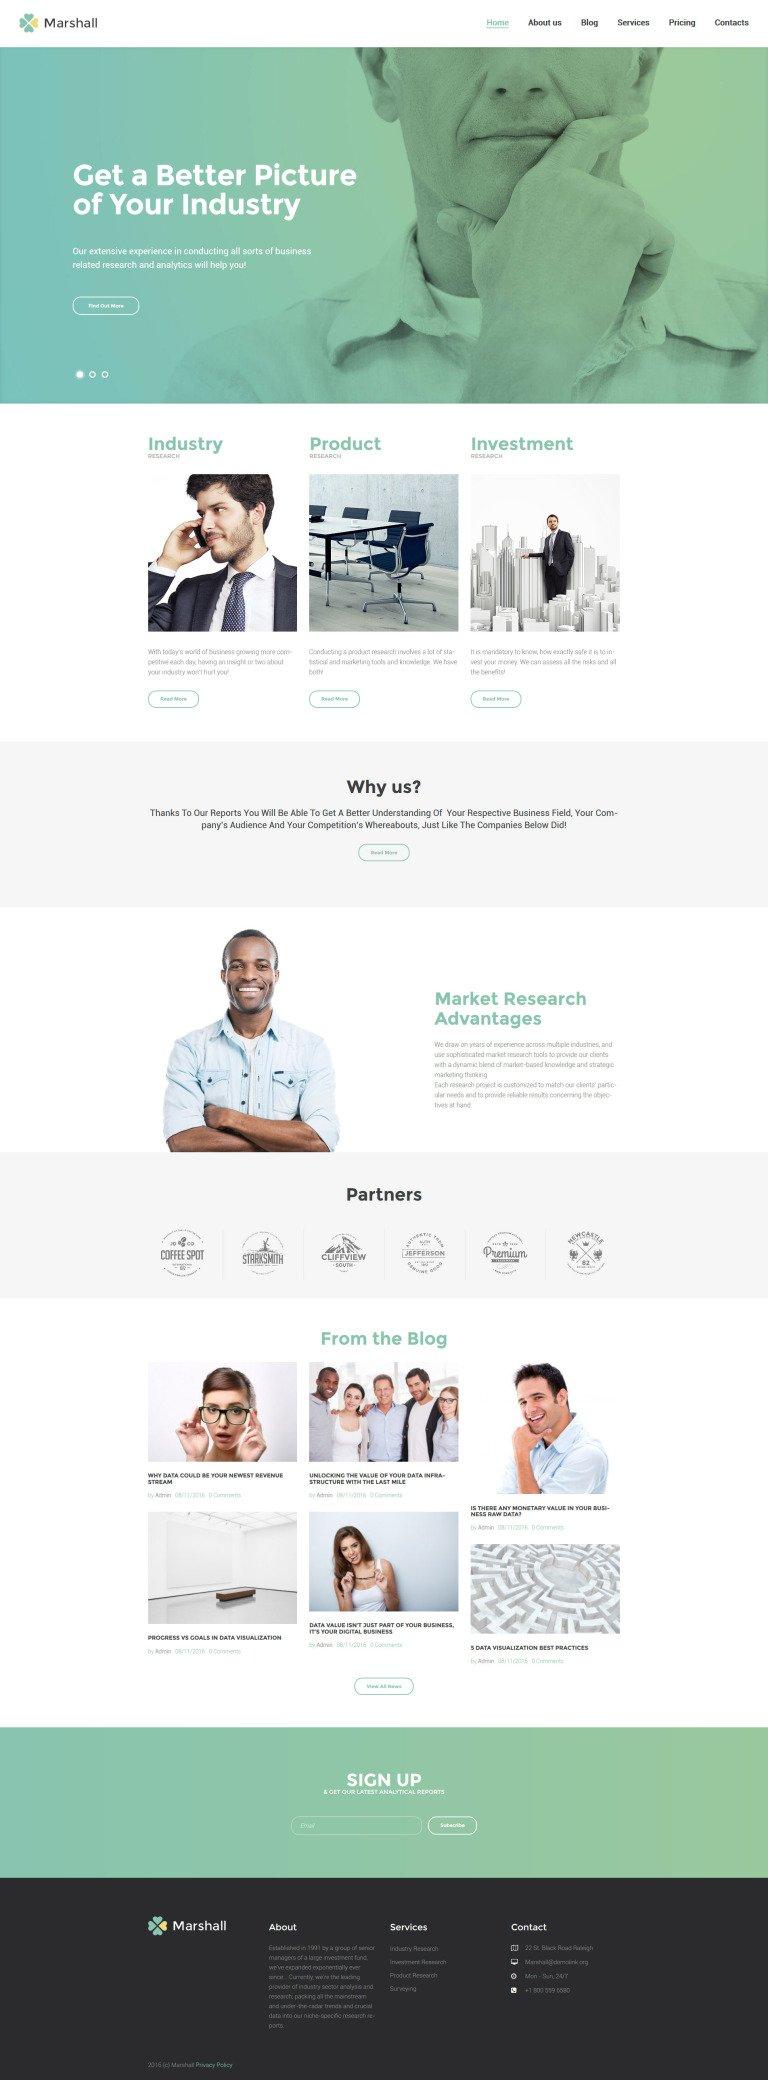 Marshal - Business Analysis and Market Research Agency WordPress Theme New Screenshots BIG